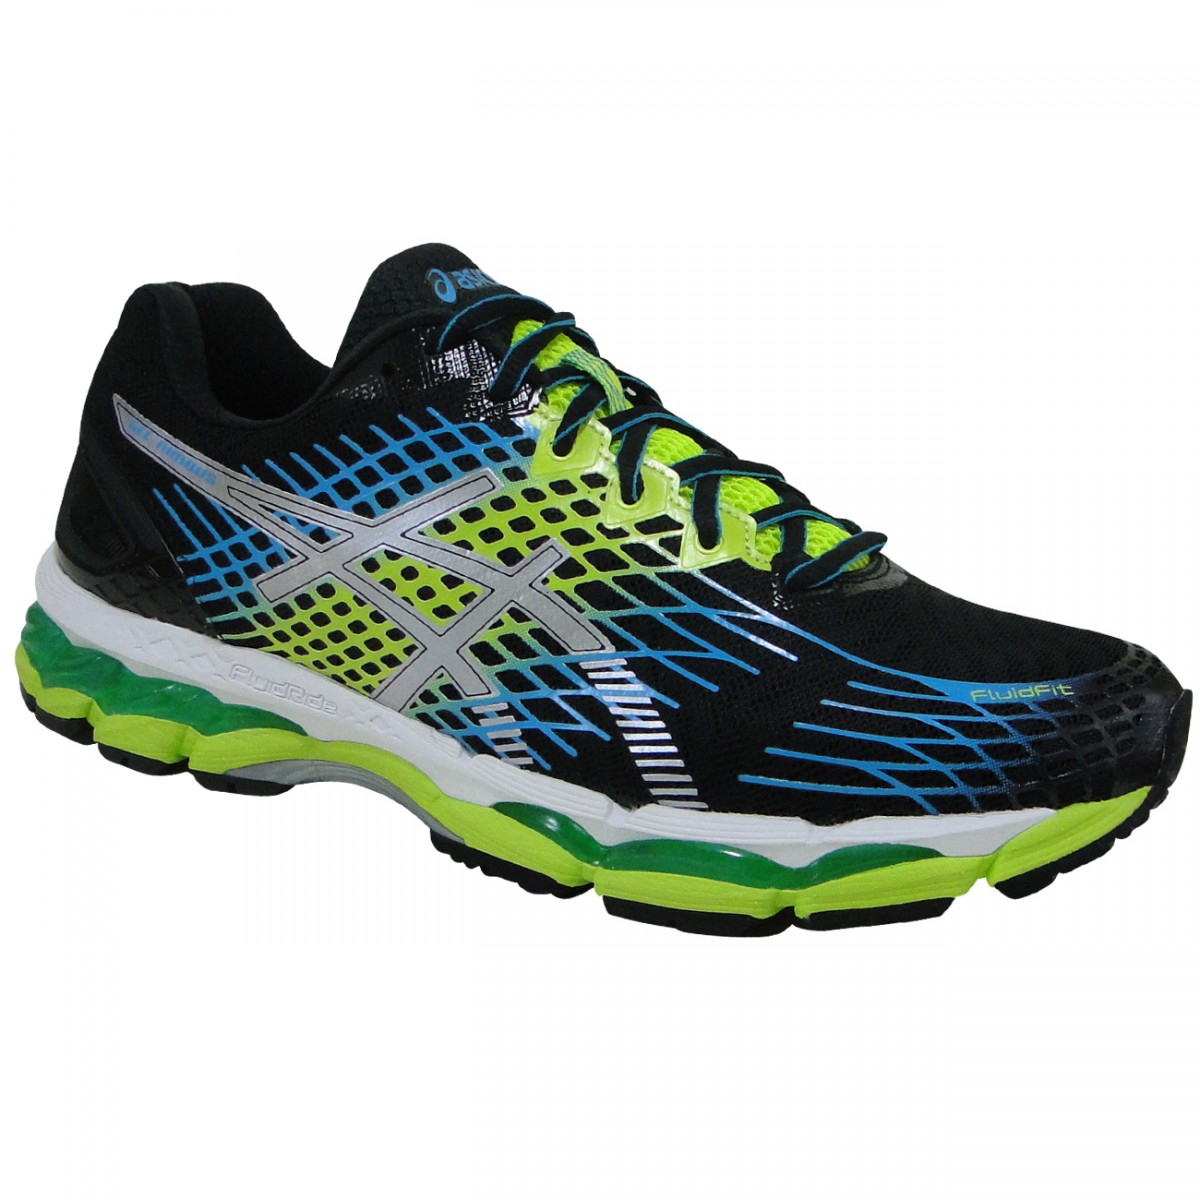 Tenis Asics Gel-Nimbus 17 T507N 9901 - Preto Verde Branco - Chuteira Nike 334ff4b638b4f